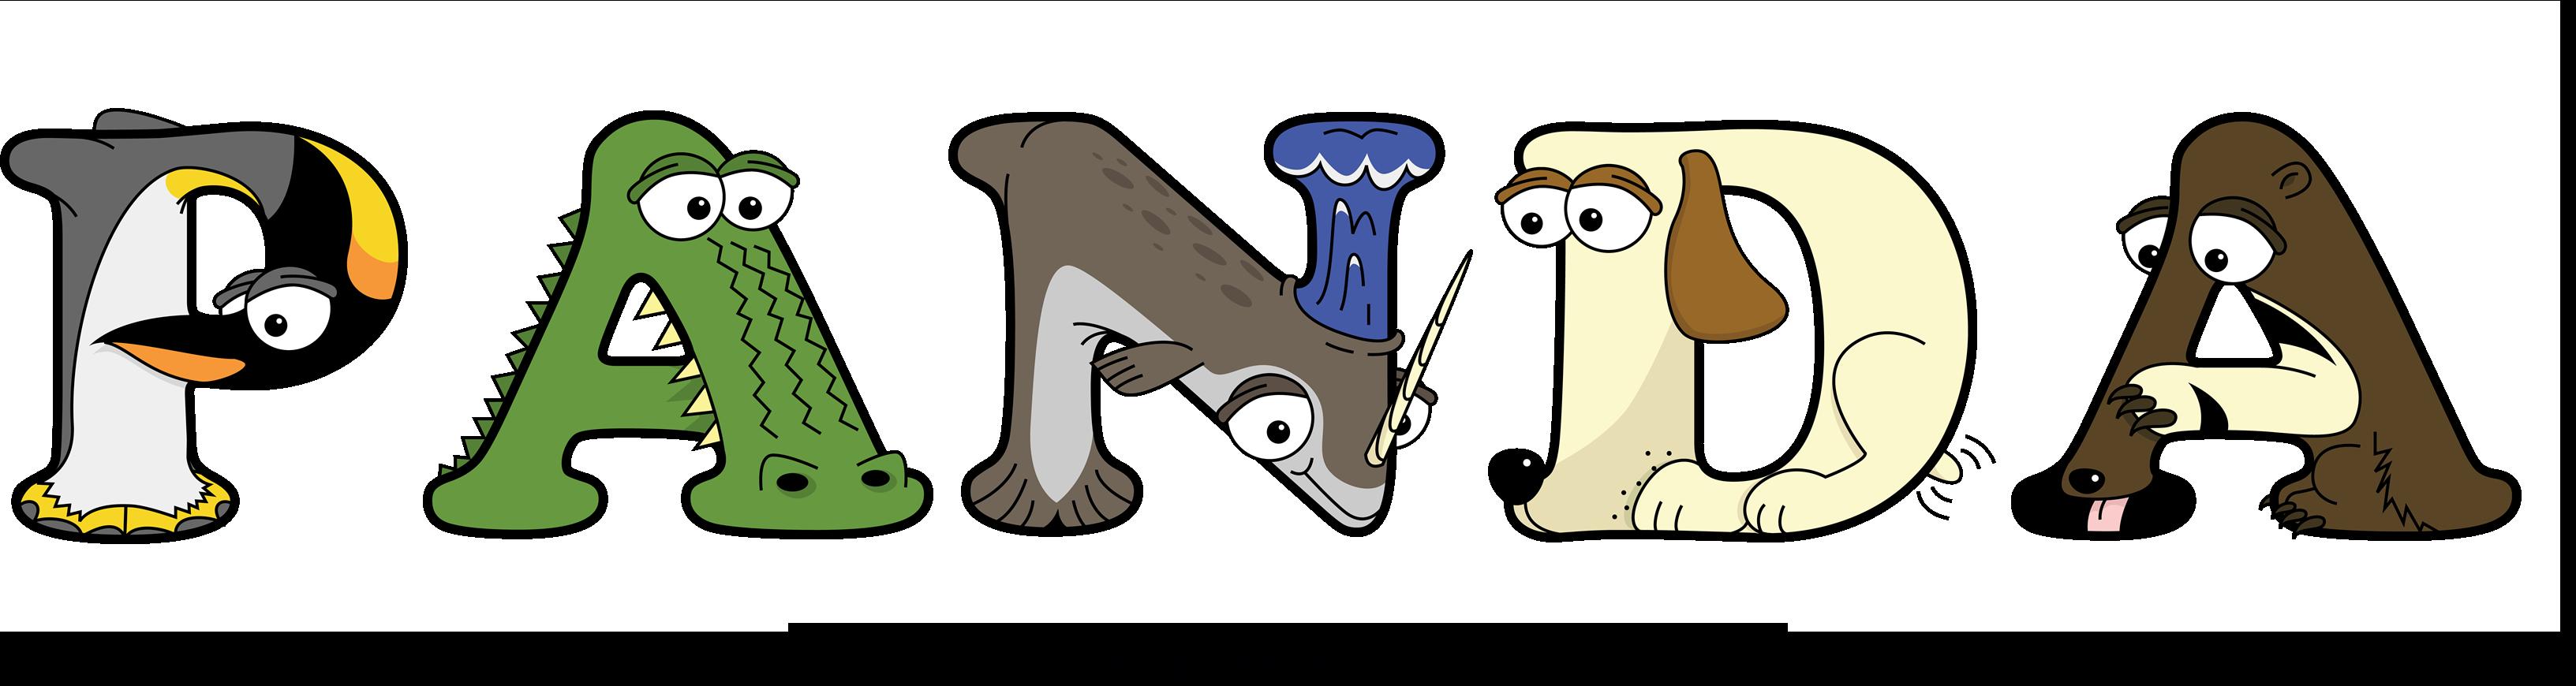 The word PANDA written in cute cartoon animal drawings